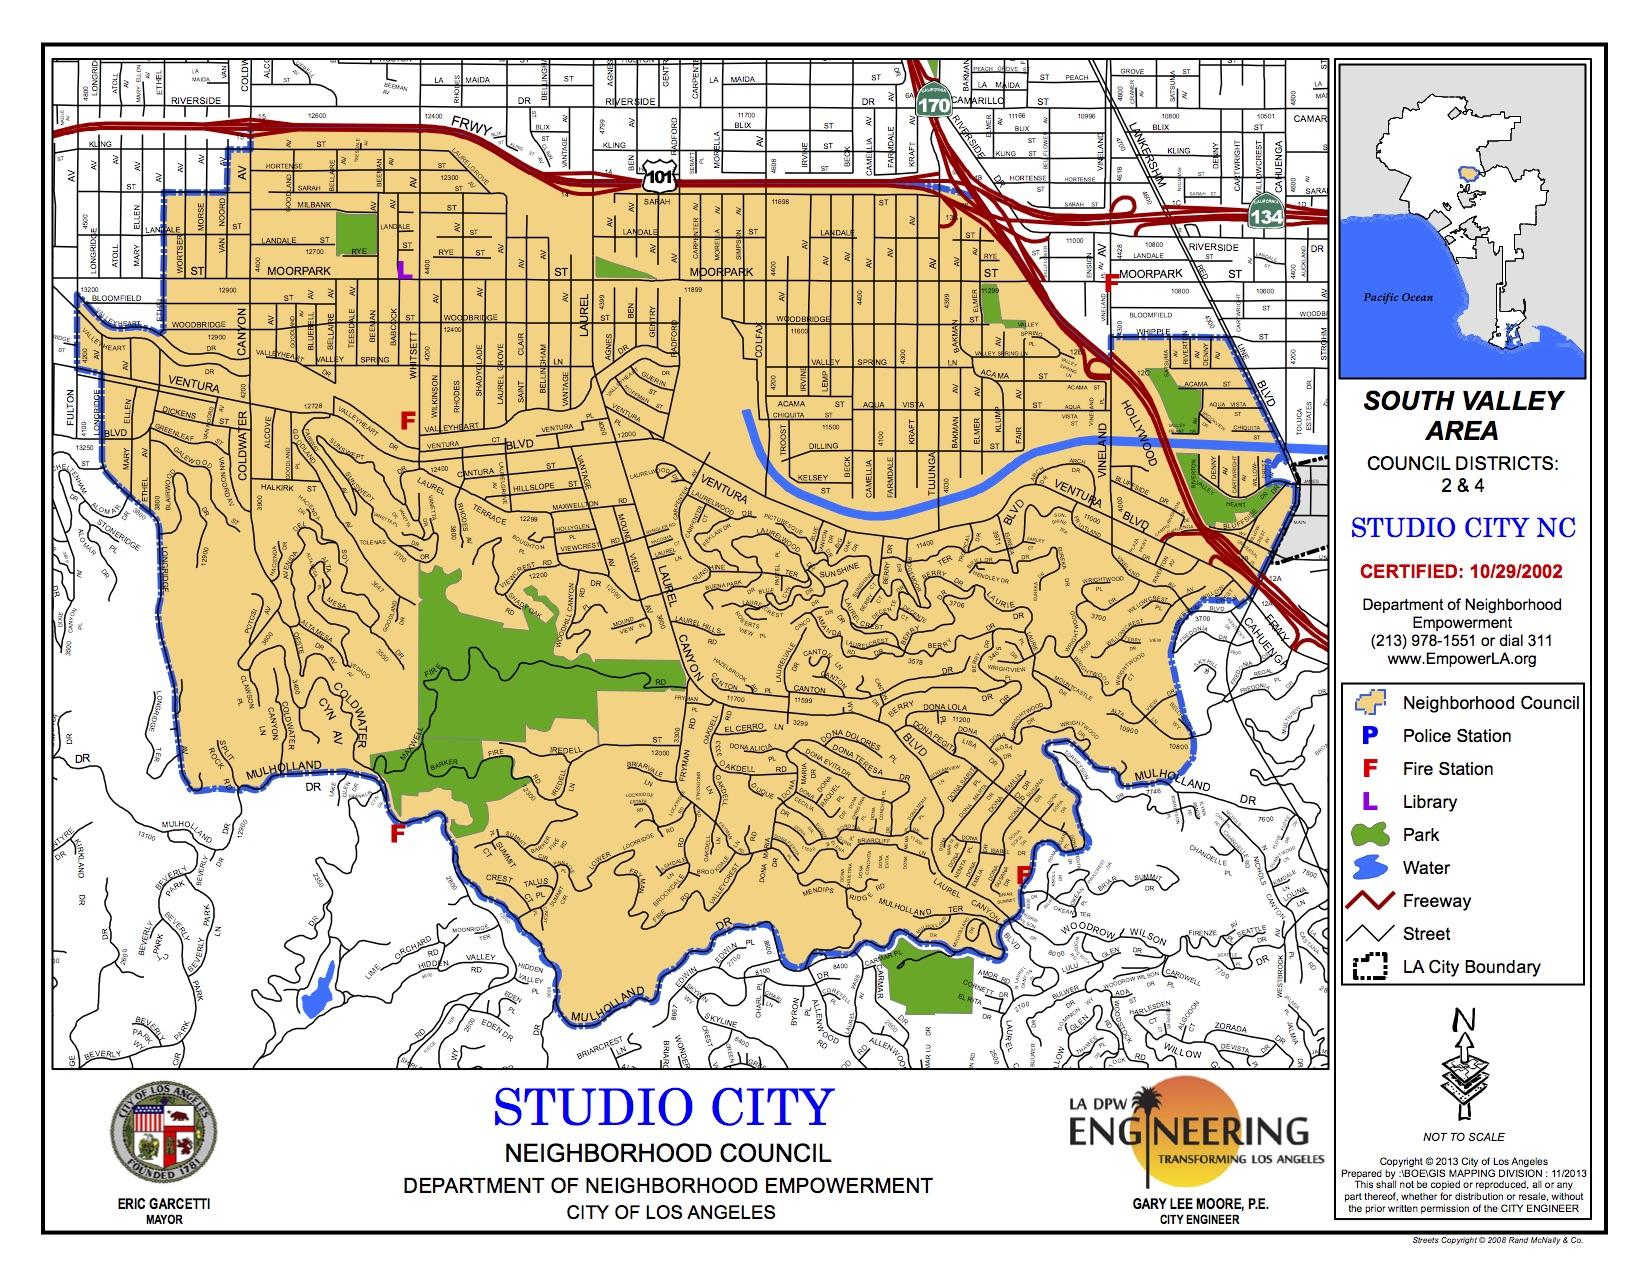 StudioCityNeighborhoodCouncilMap Los Angeles Real Estate - Los angeles map districts